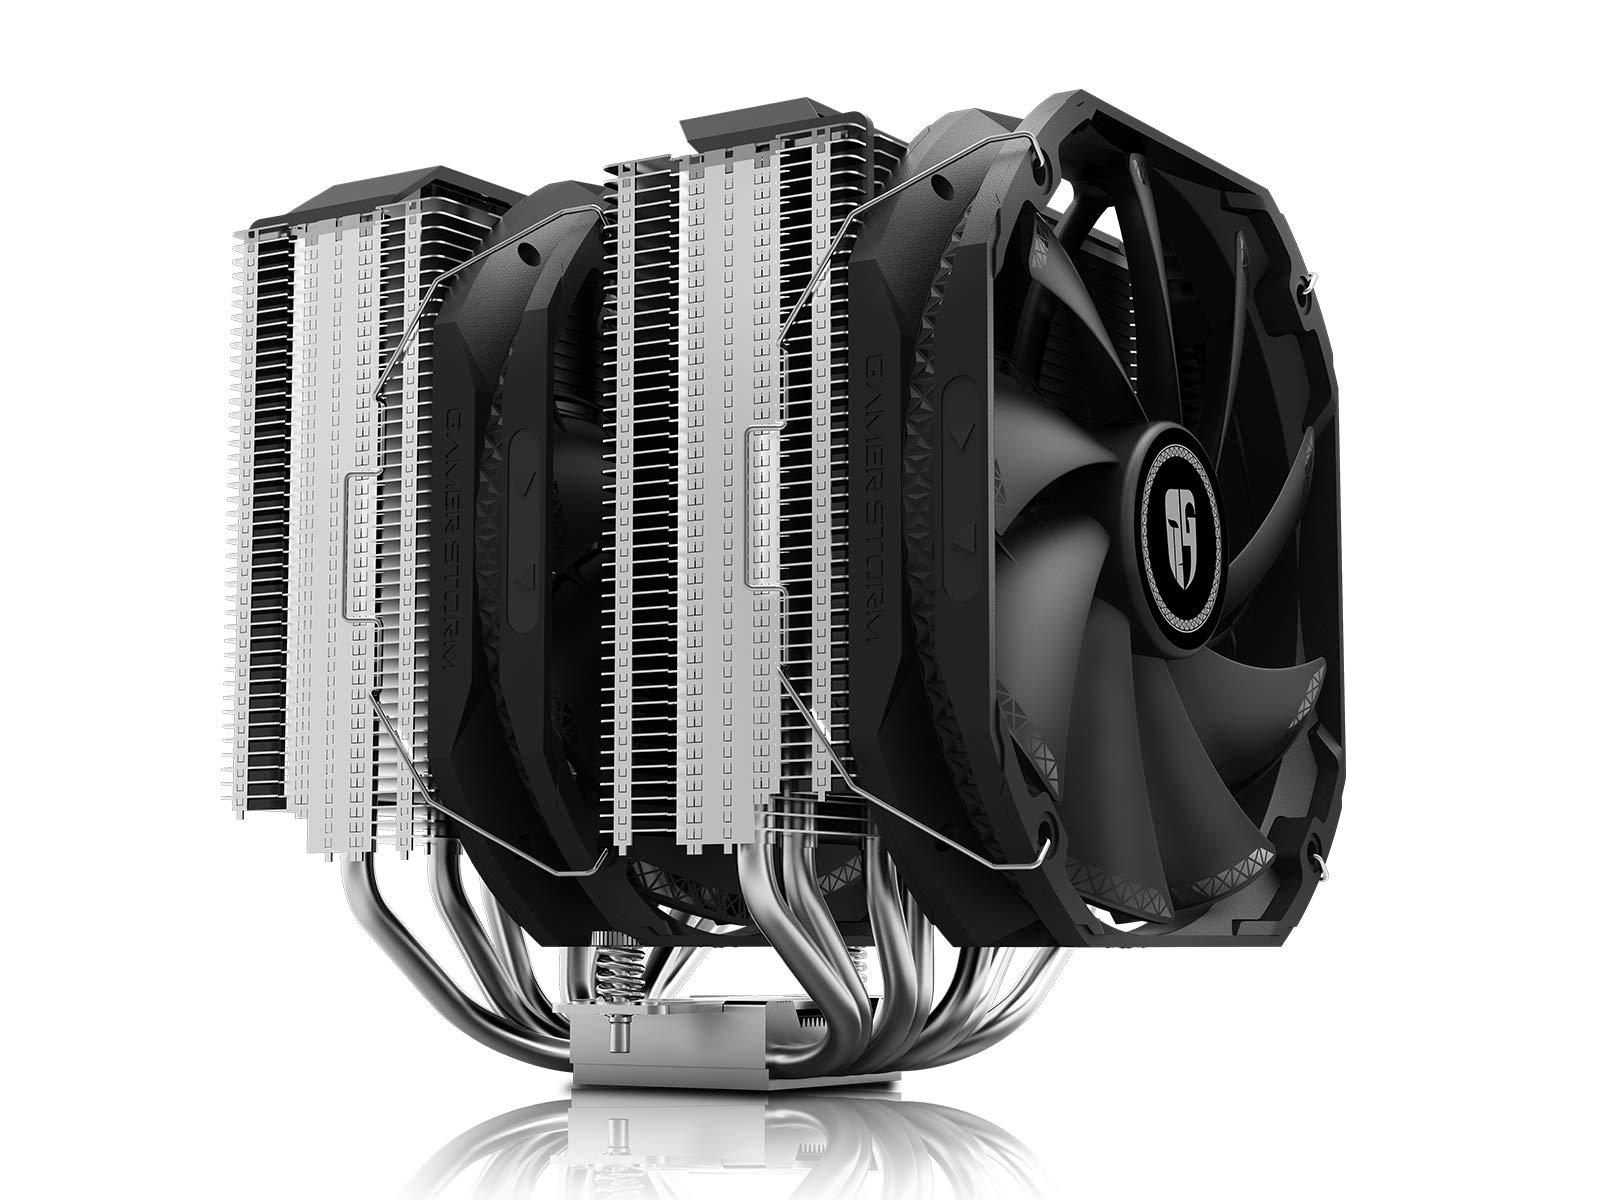 Deep Cool Assassin Iii Air Cpu Cooler, 7 Heatpipes, Dual 140